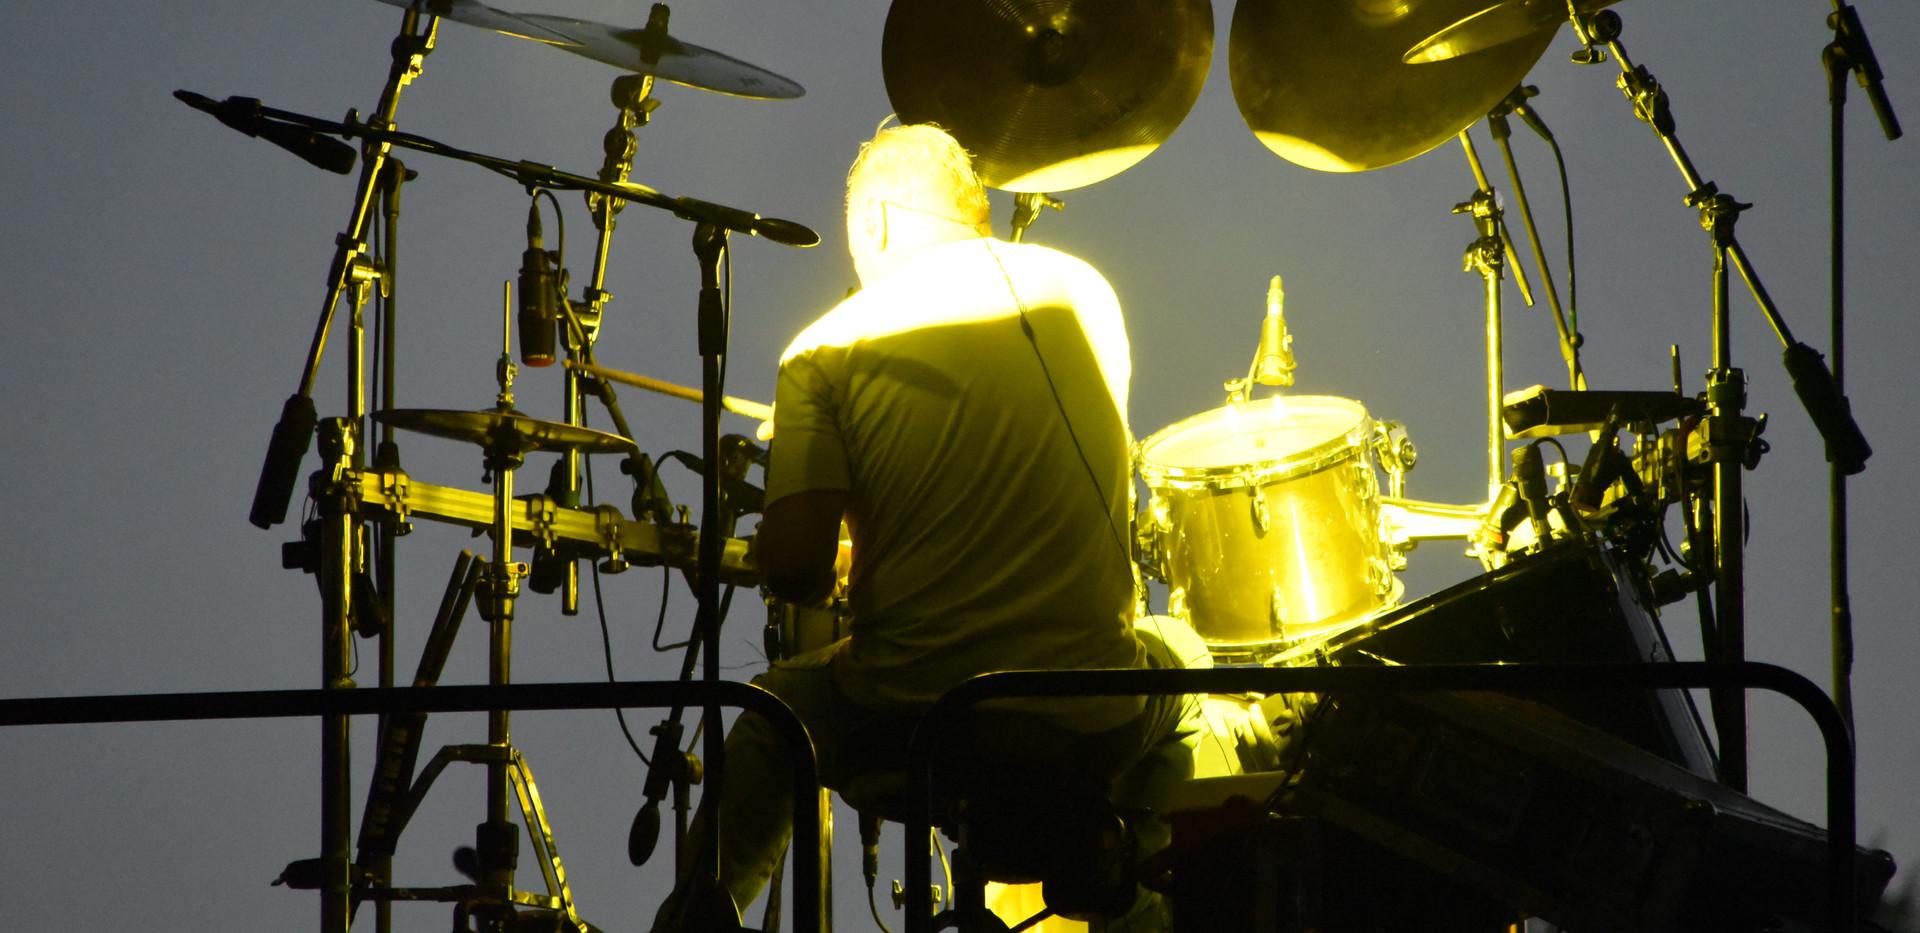 38 Special drummer